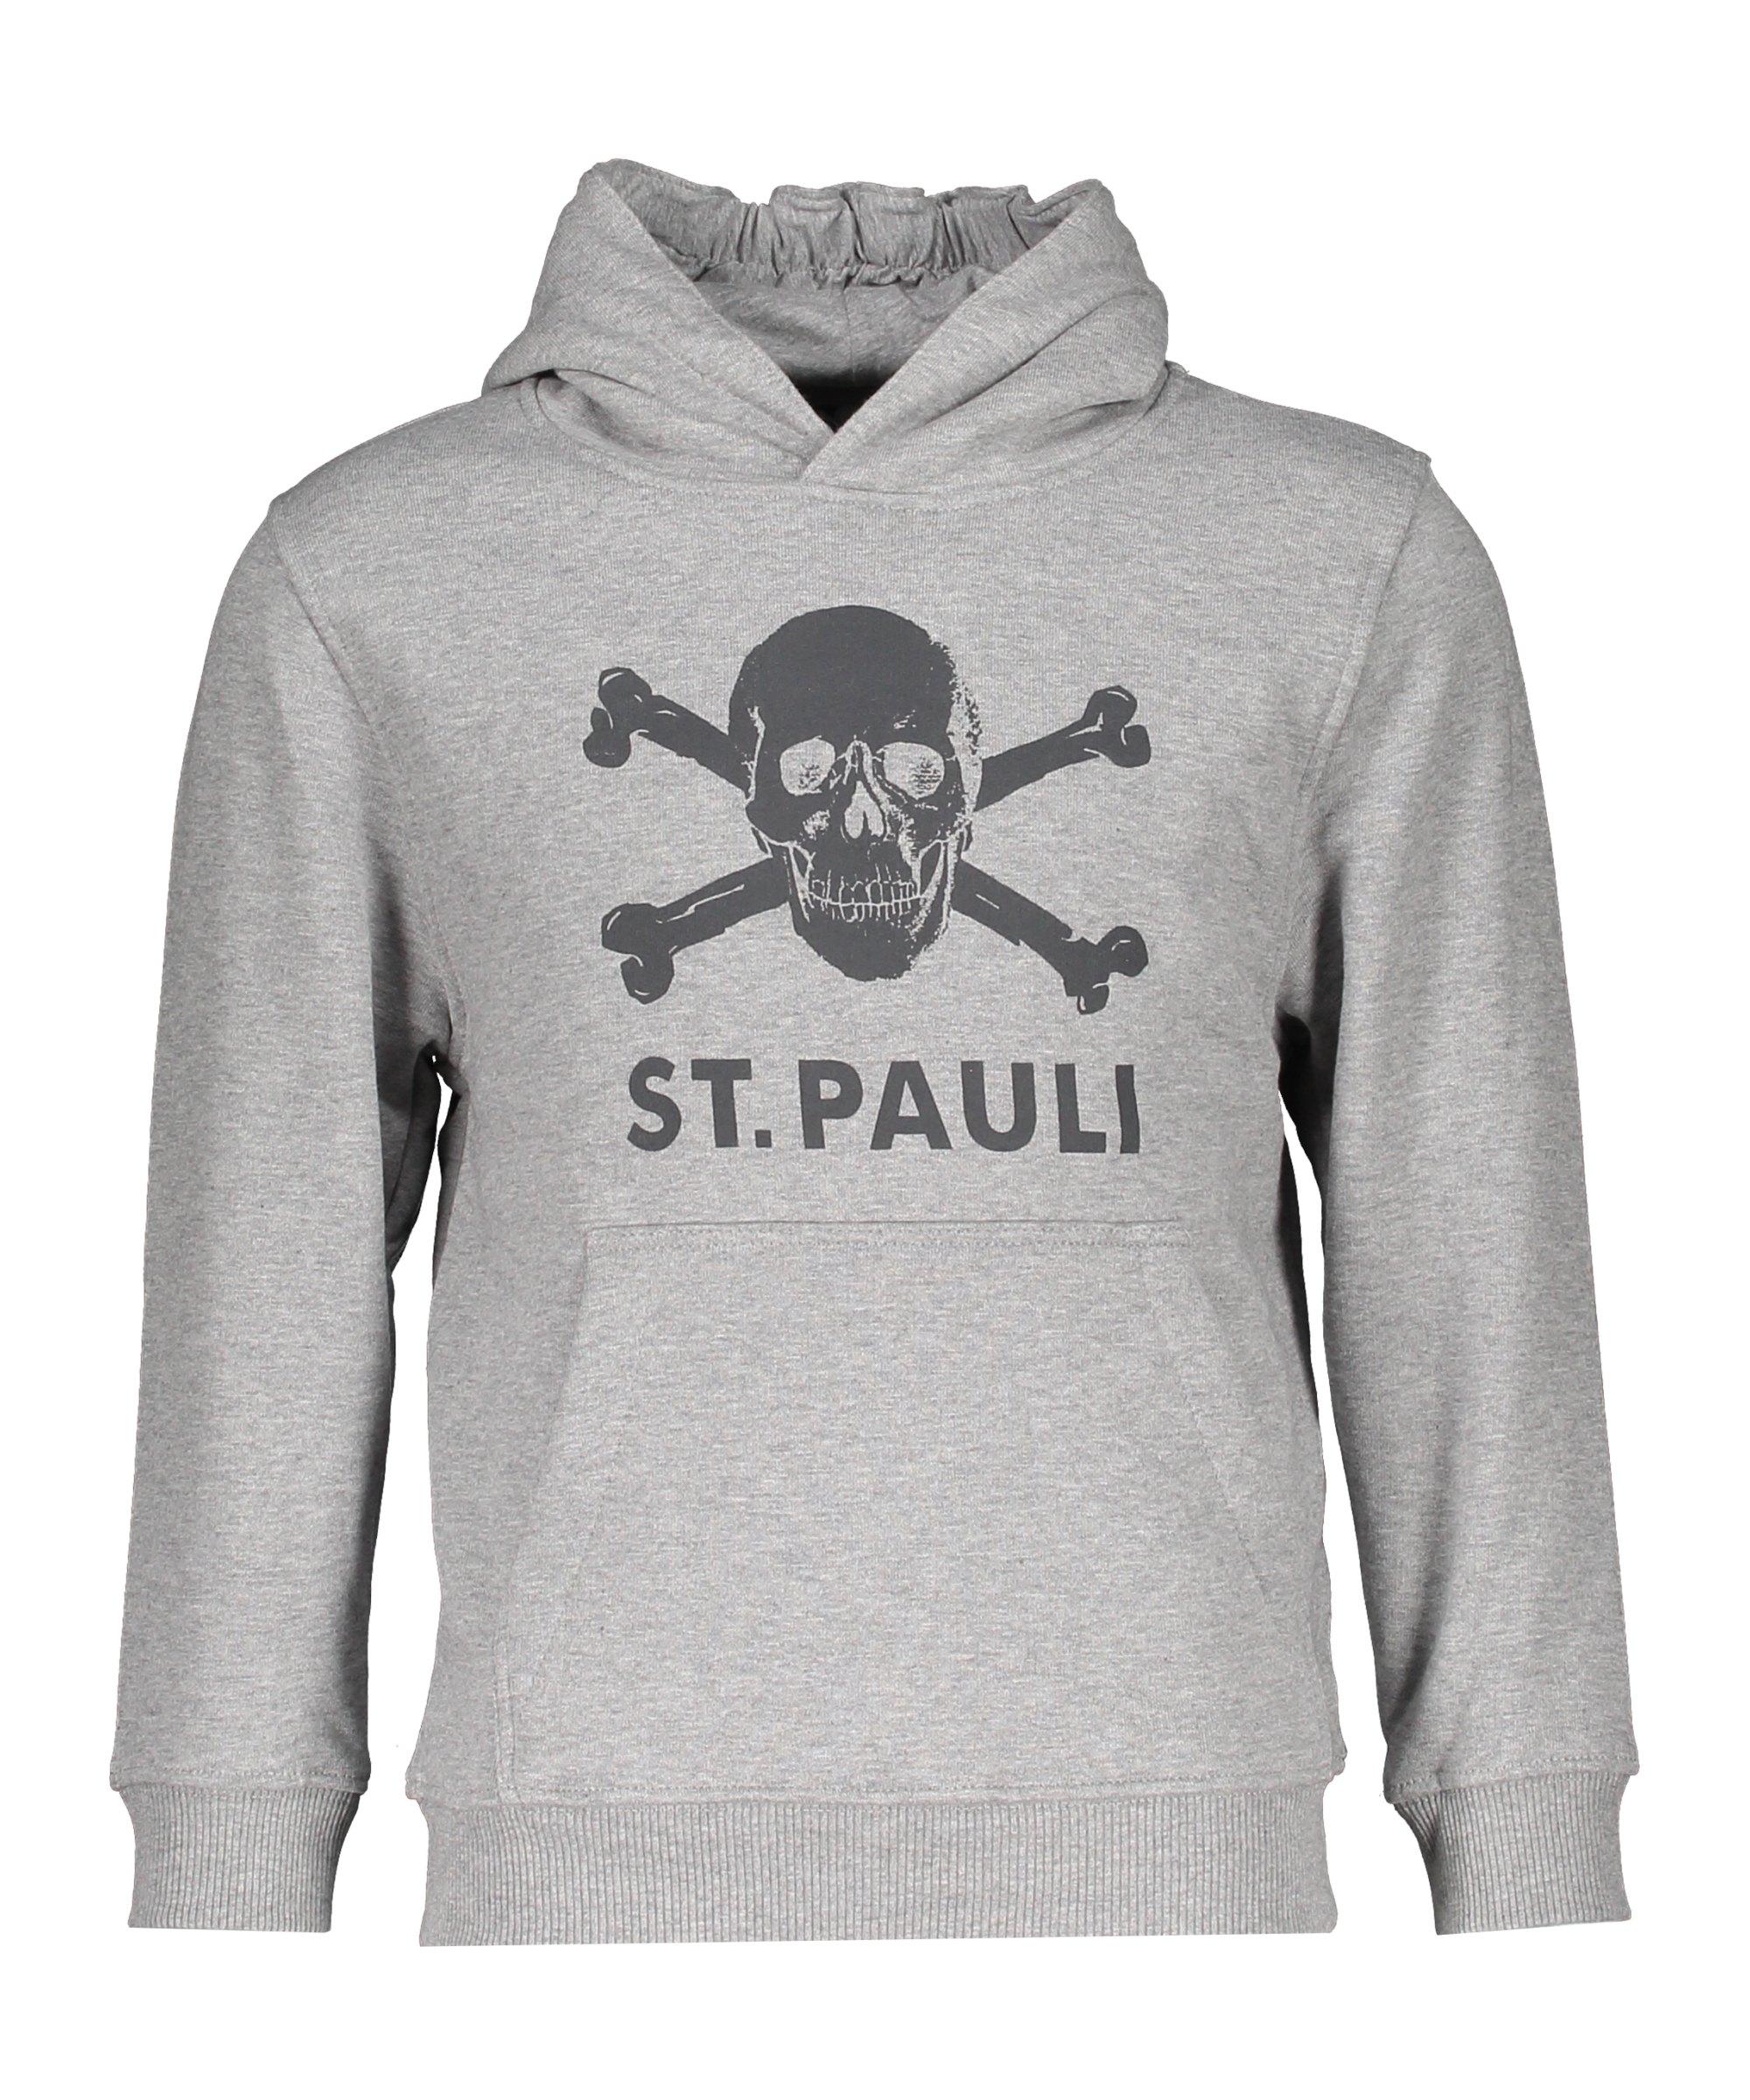 FC St. Pauli Totenkopf Hoody Kids Grau - grau